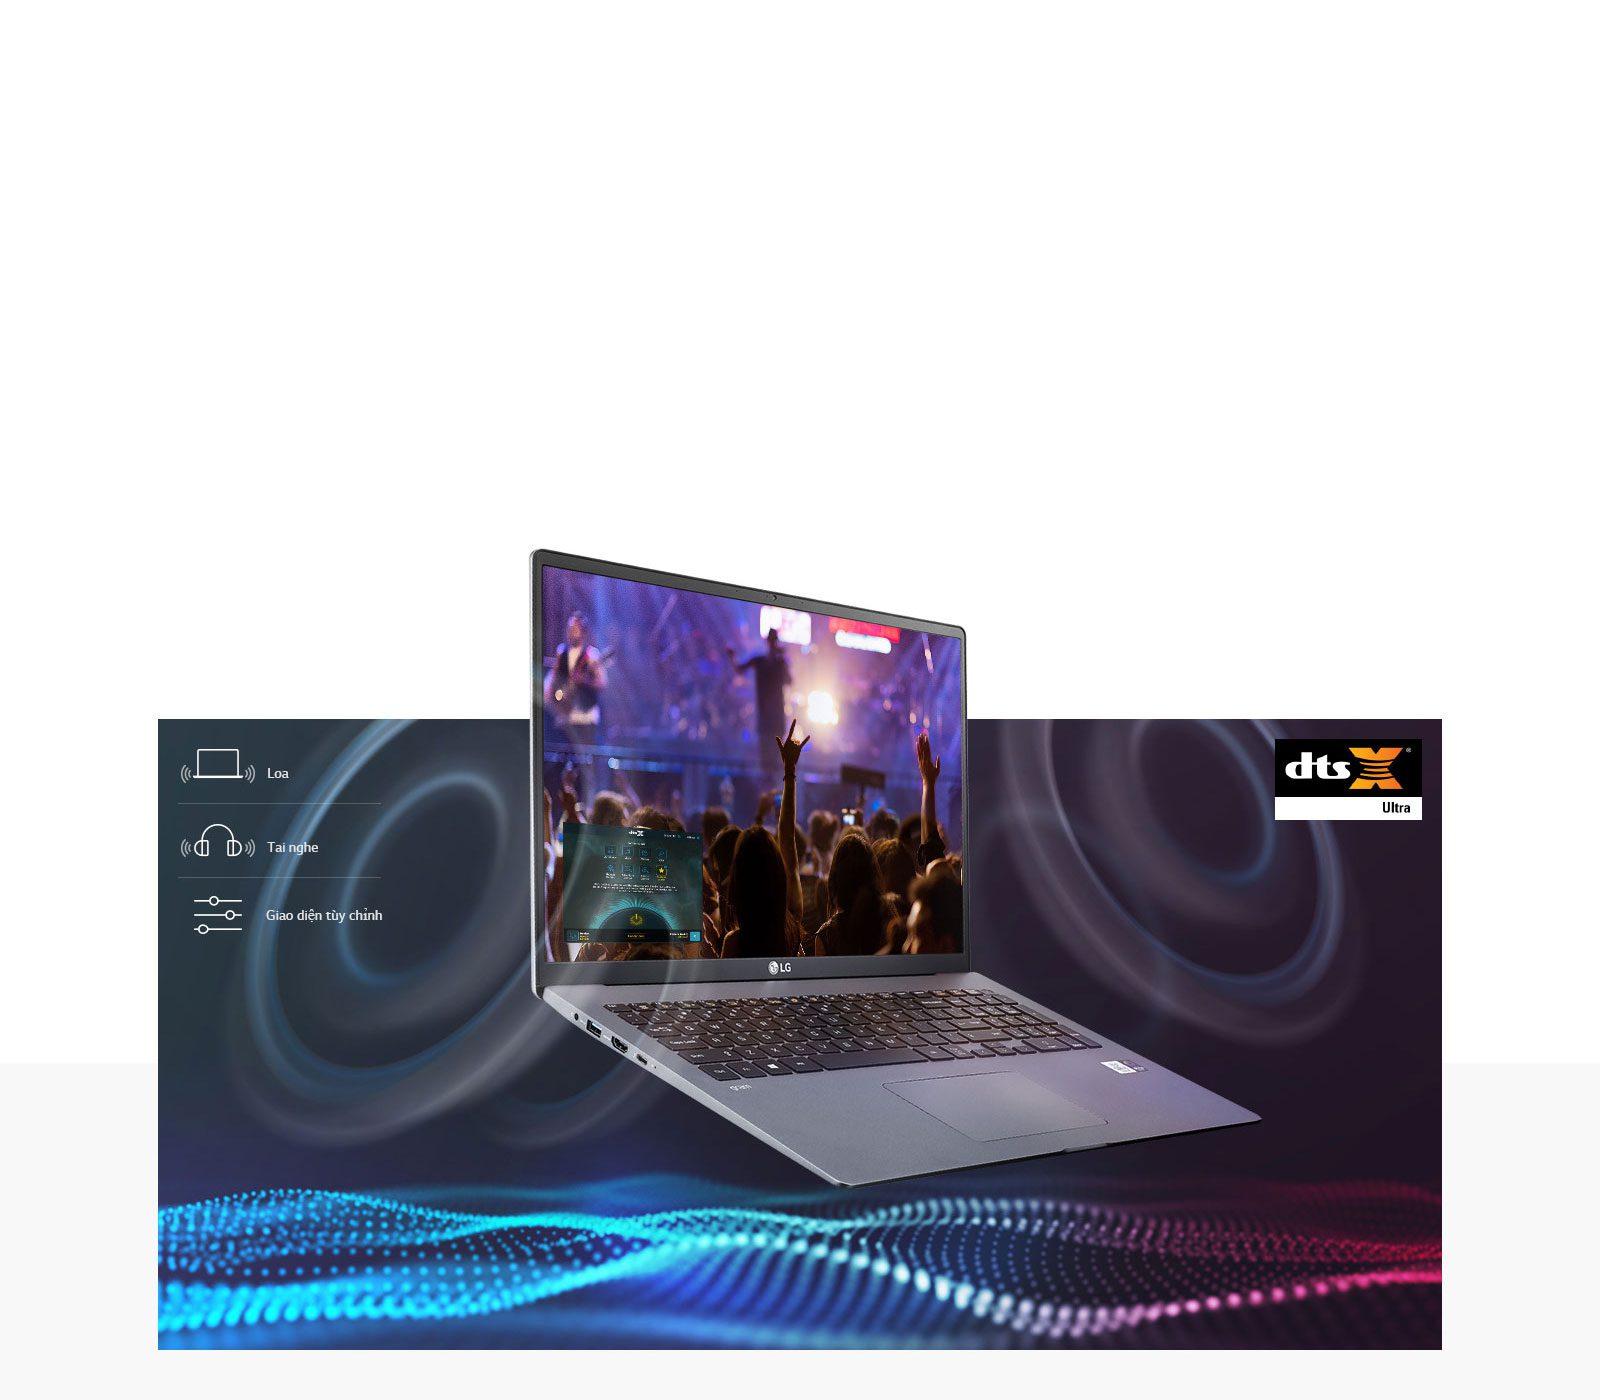 gram 17Z90N DS 09 DTSX Ultra D bb1